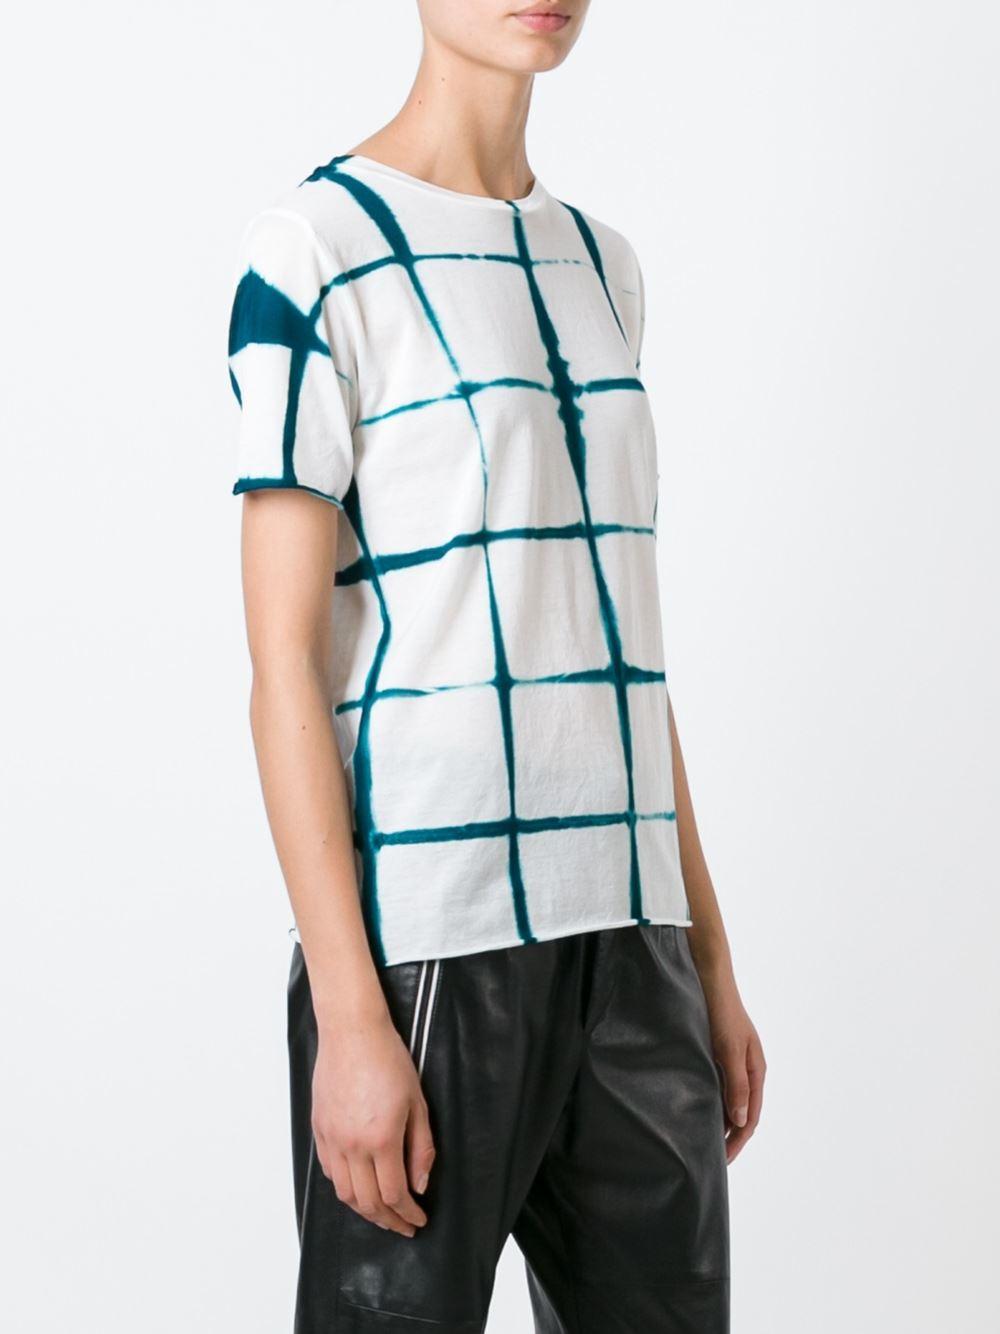 Lyst suzusan tie dye print t shirt in green for Tie dye printed shirts